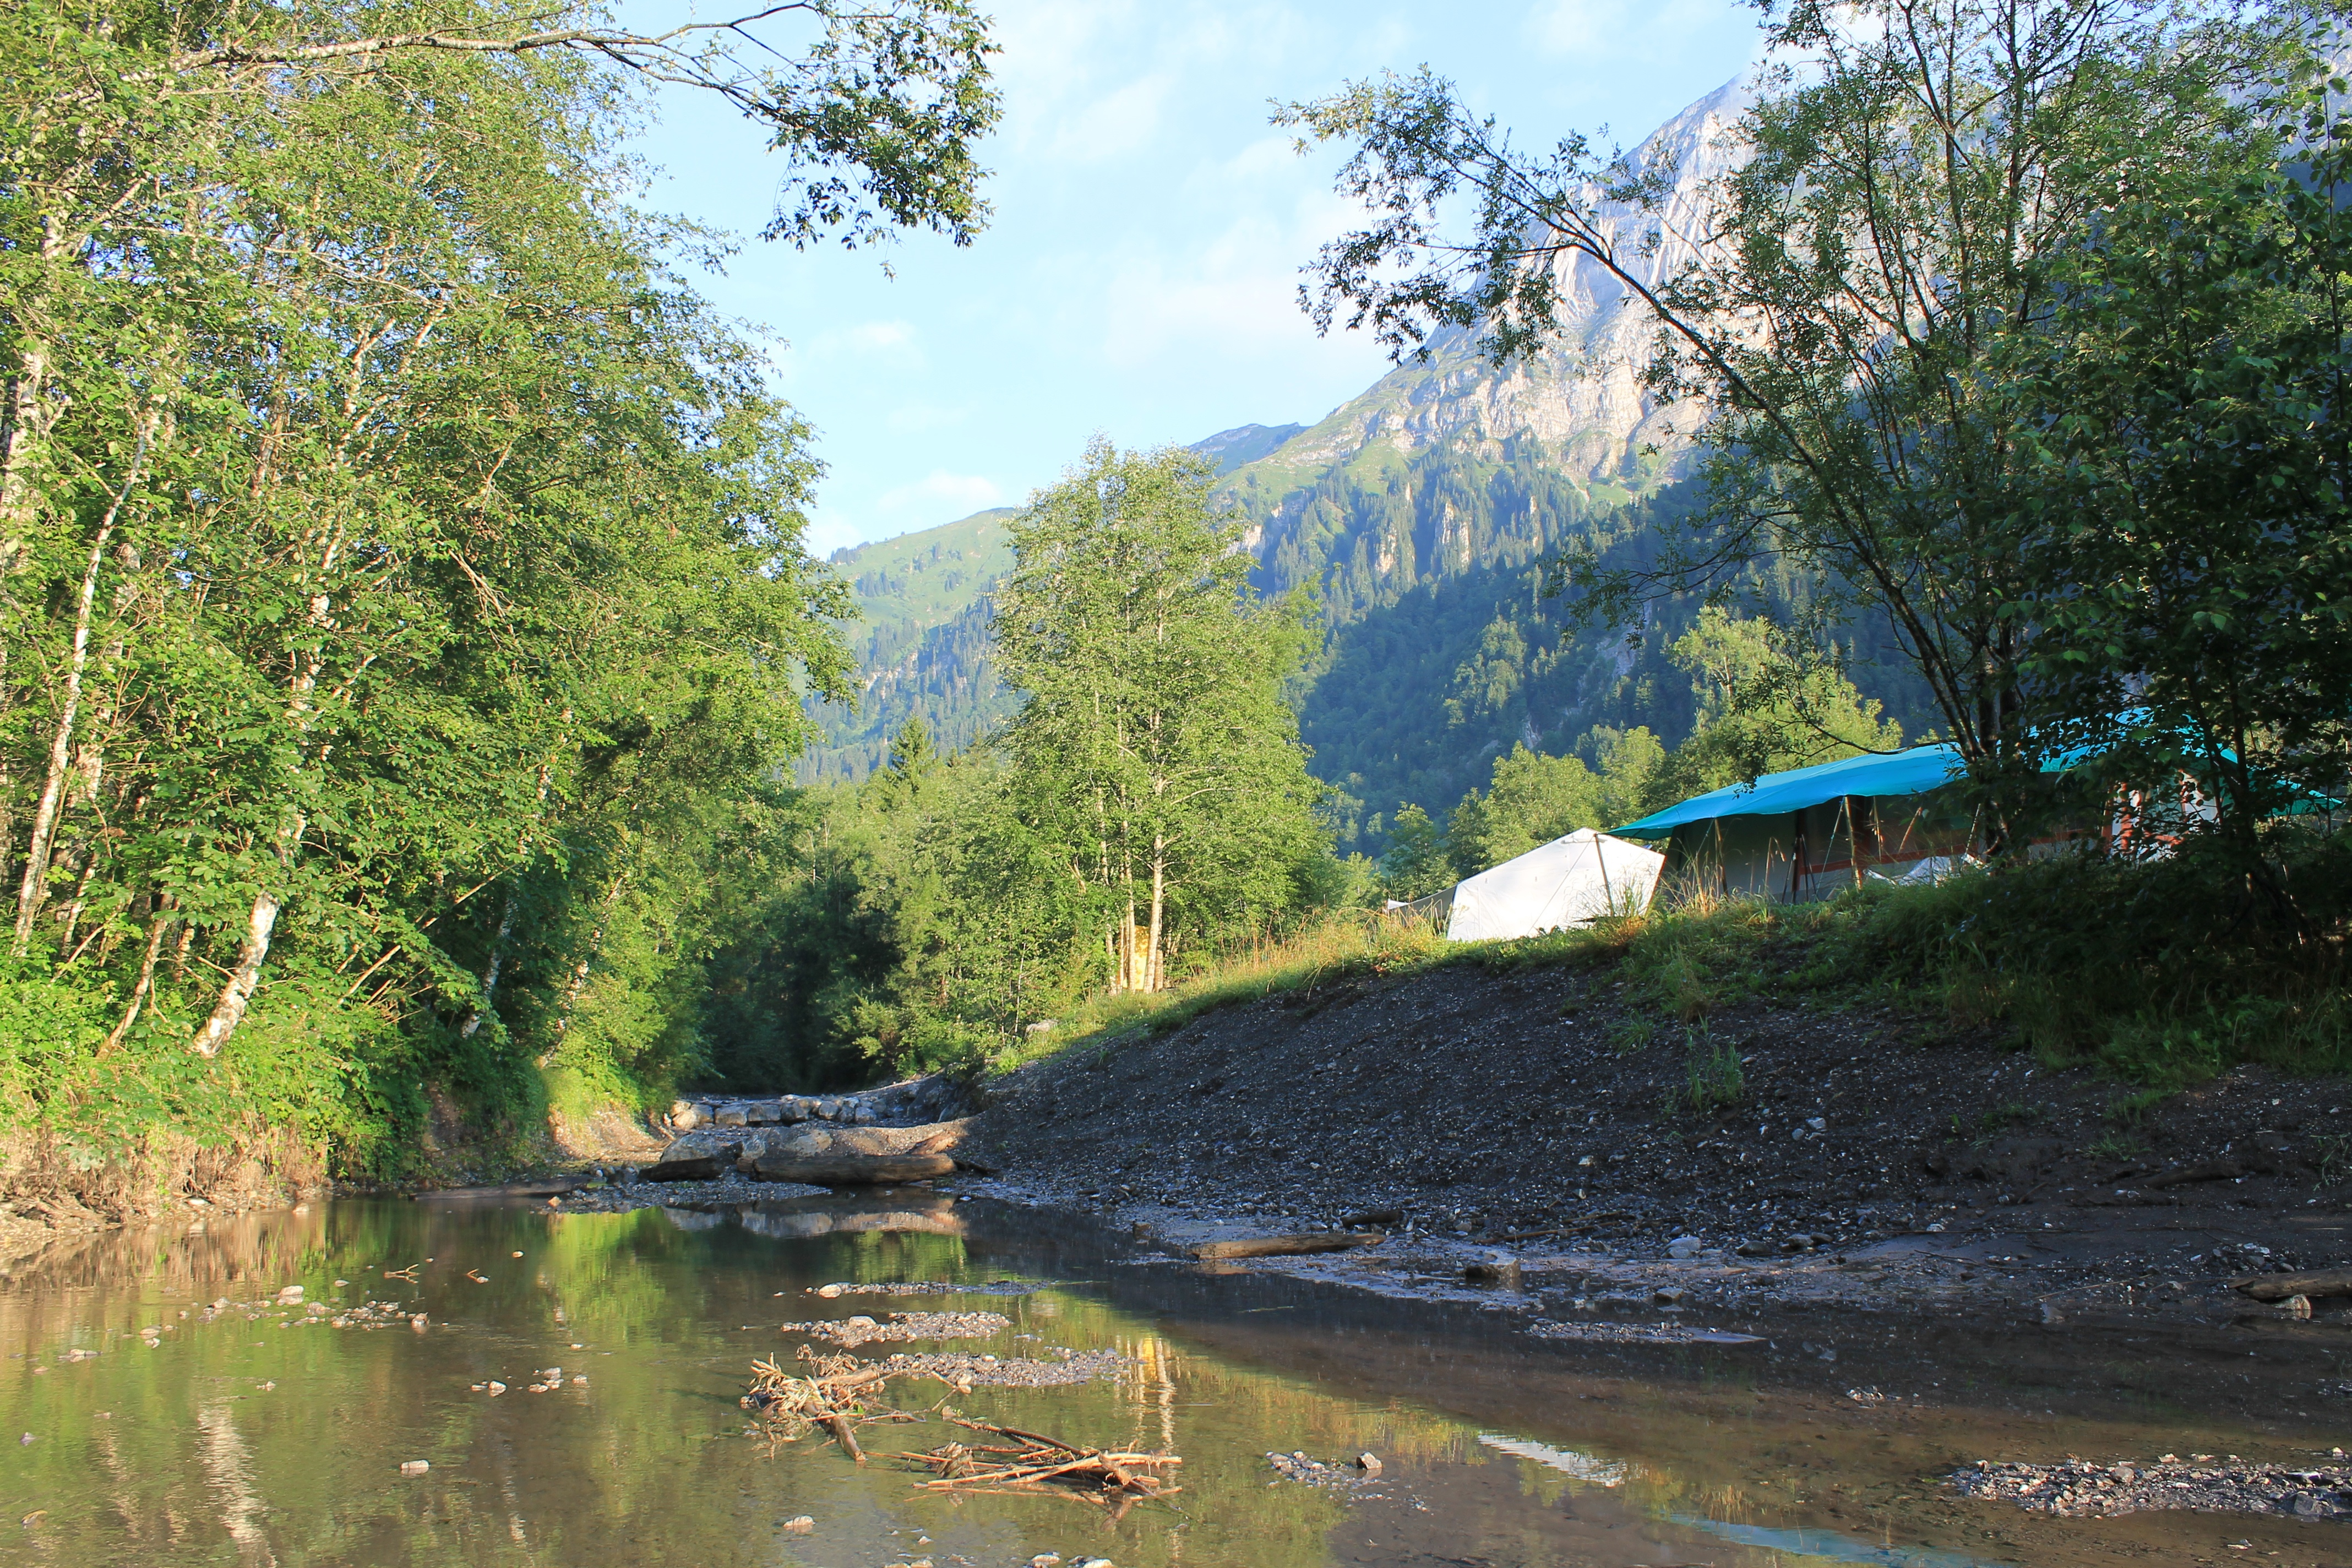 Fileklöntalersee Camping Vorauen 9691780151jpg Wikimedia Commons